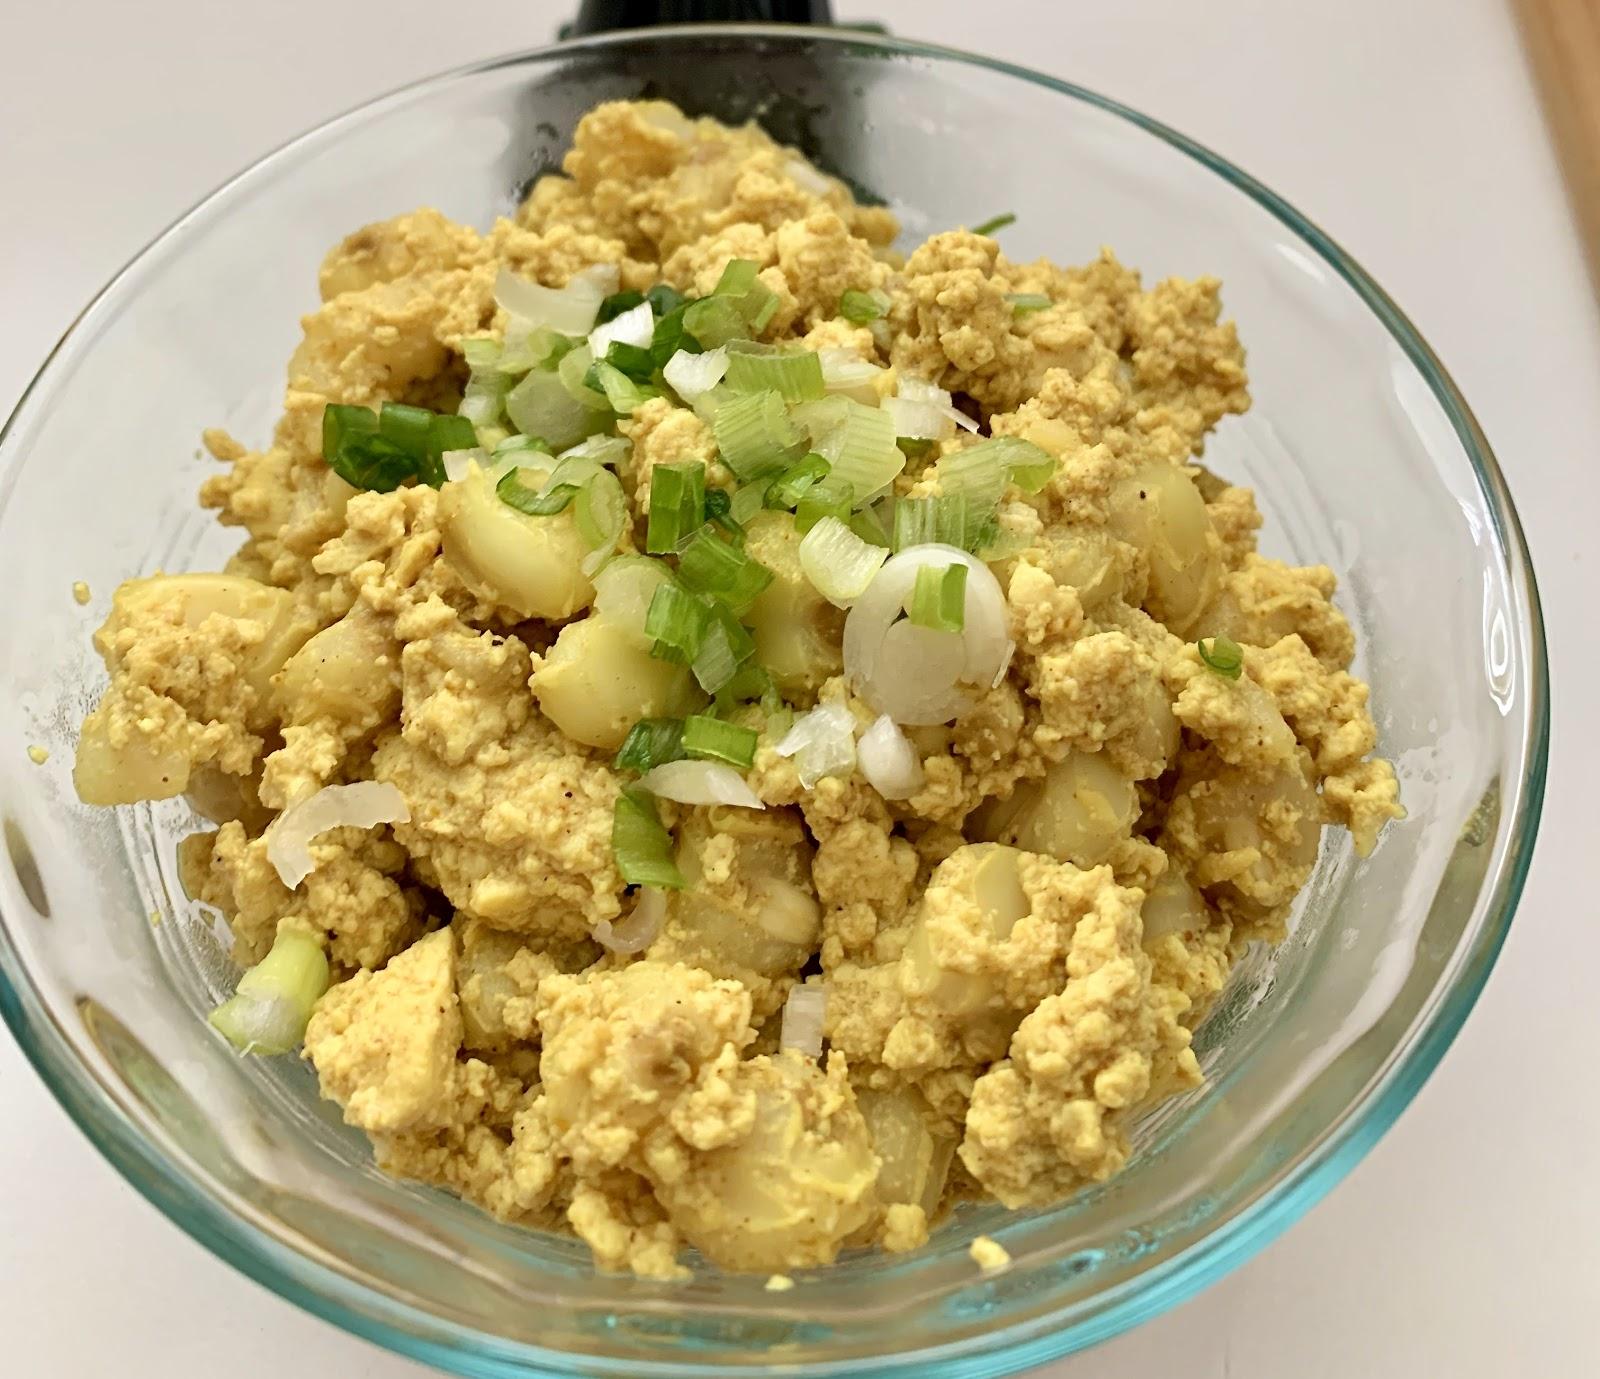 Hominy & Tofu Scramble, aka 'Mote Pillo'